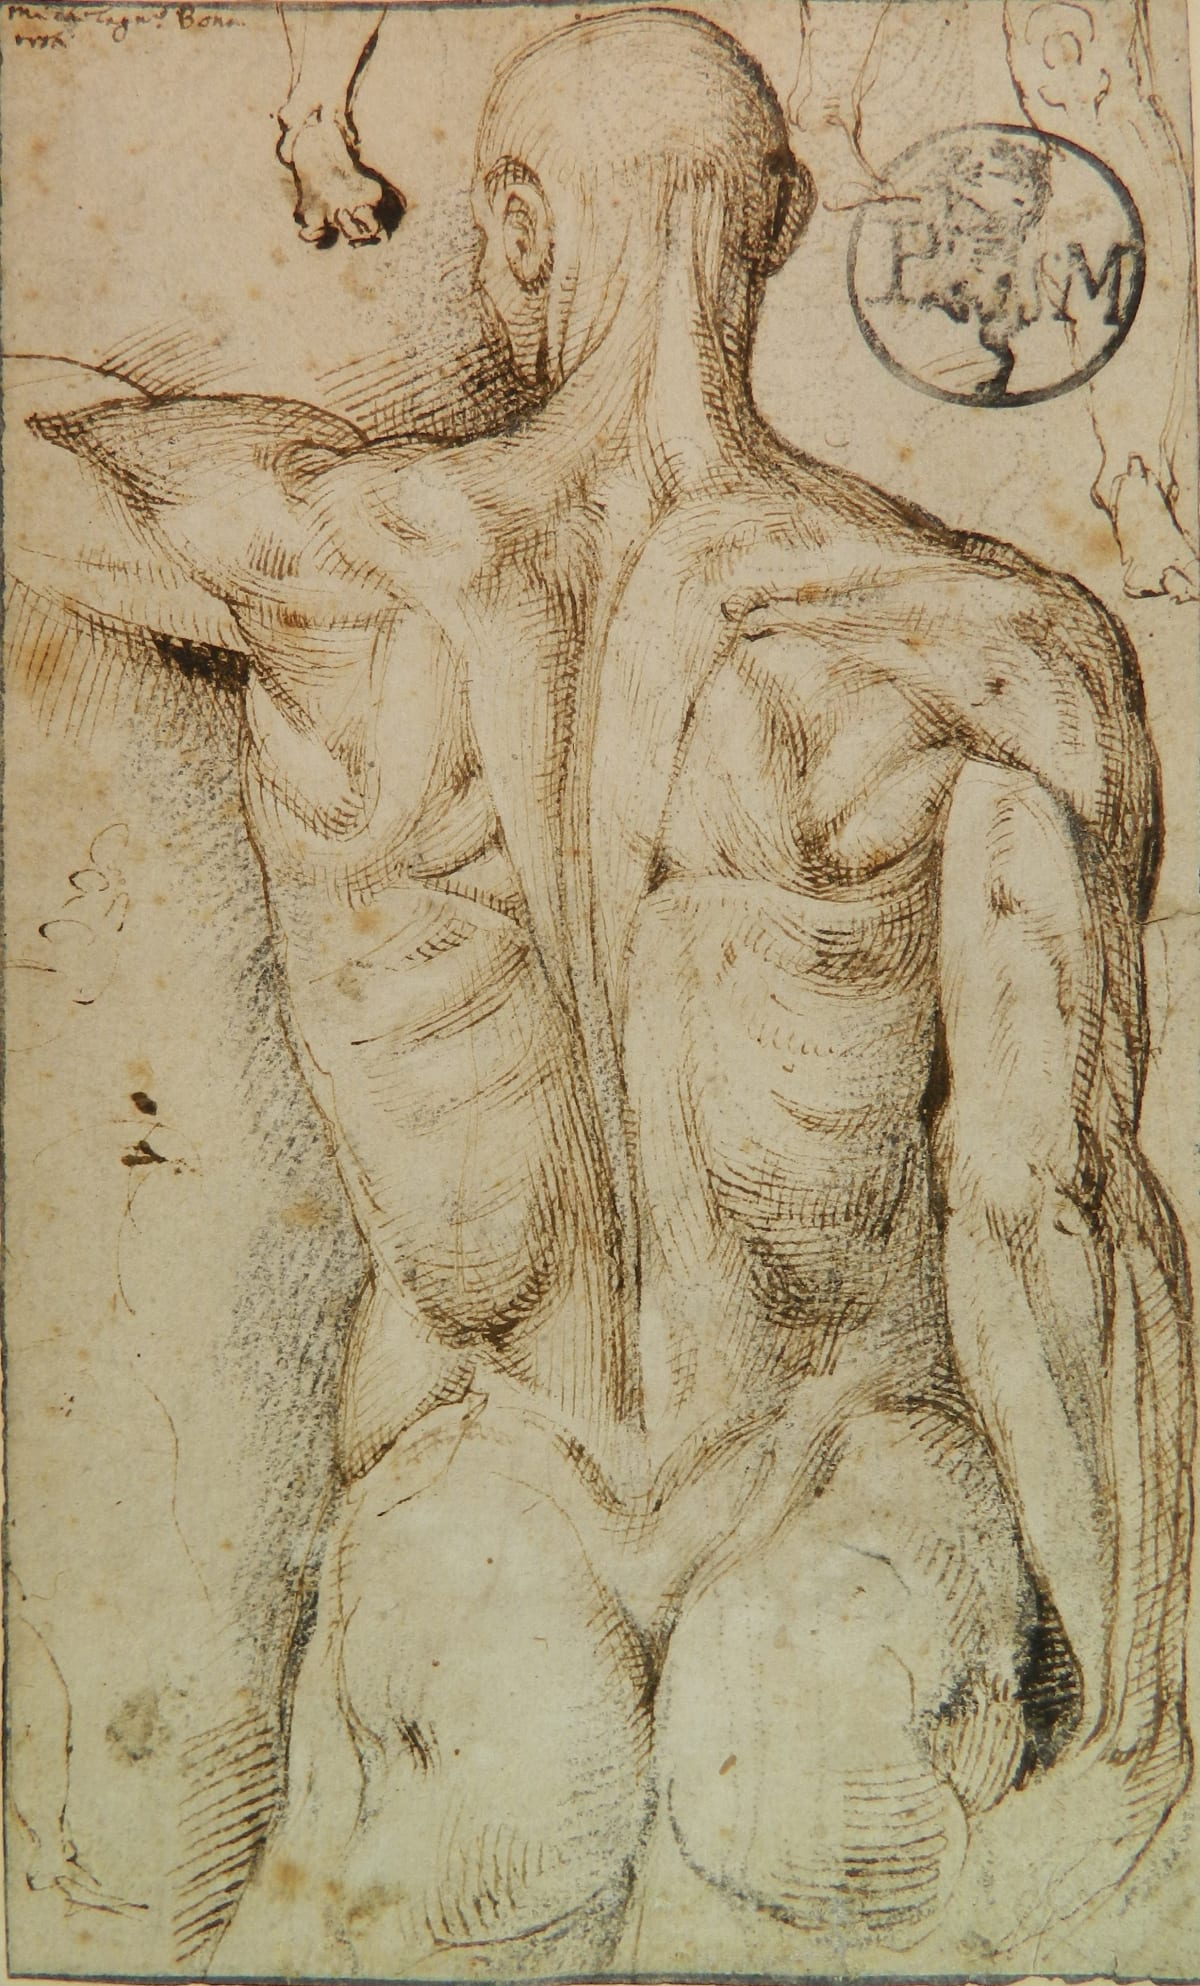 Circle of Michelangelo (1475-1564) Anatomy Study (recto) and Skeletal Study (verso)